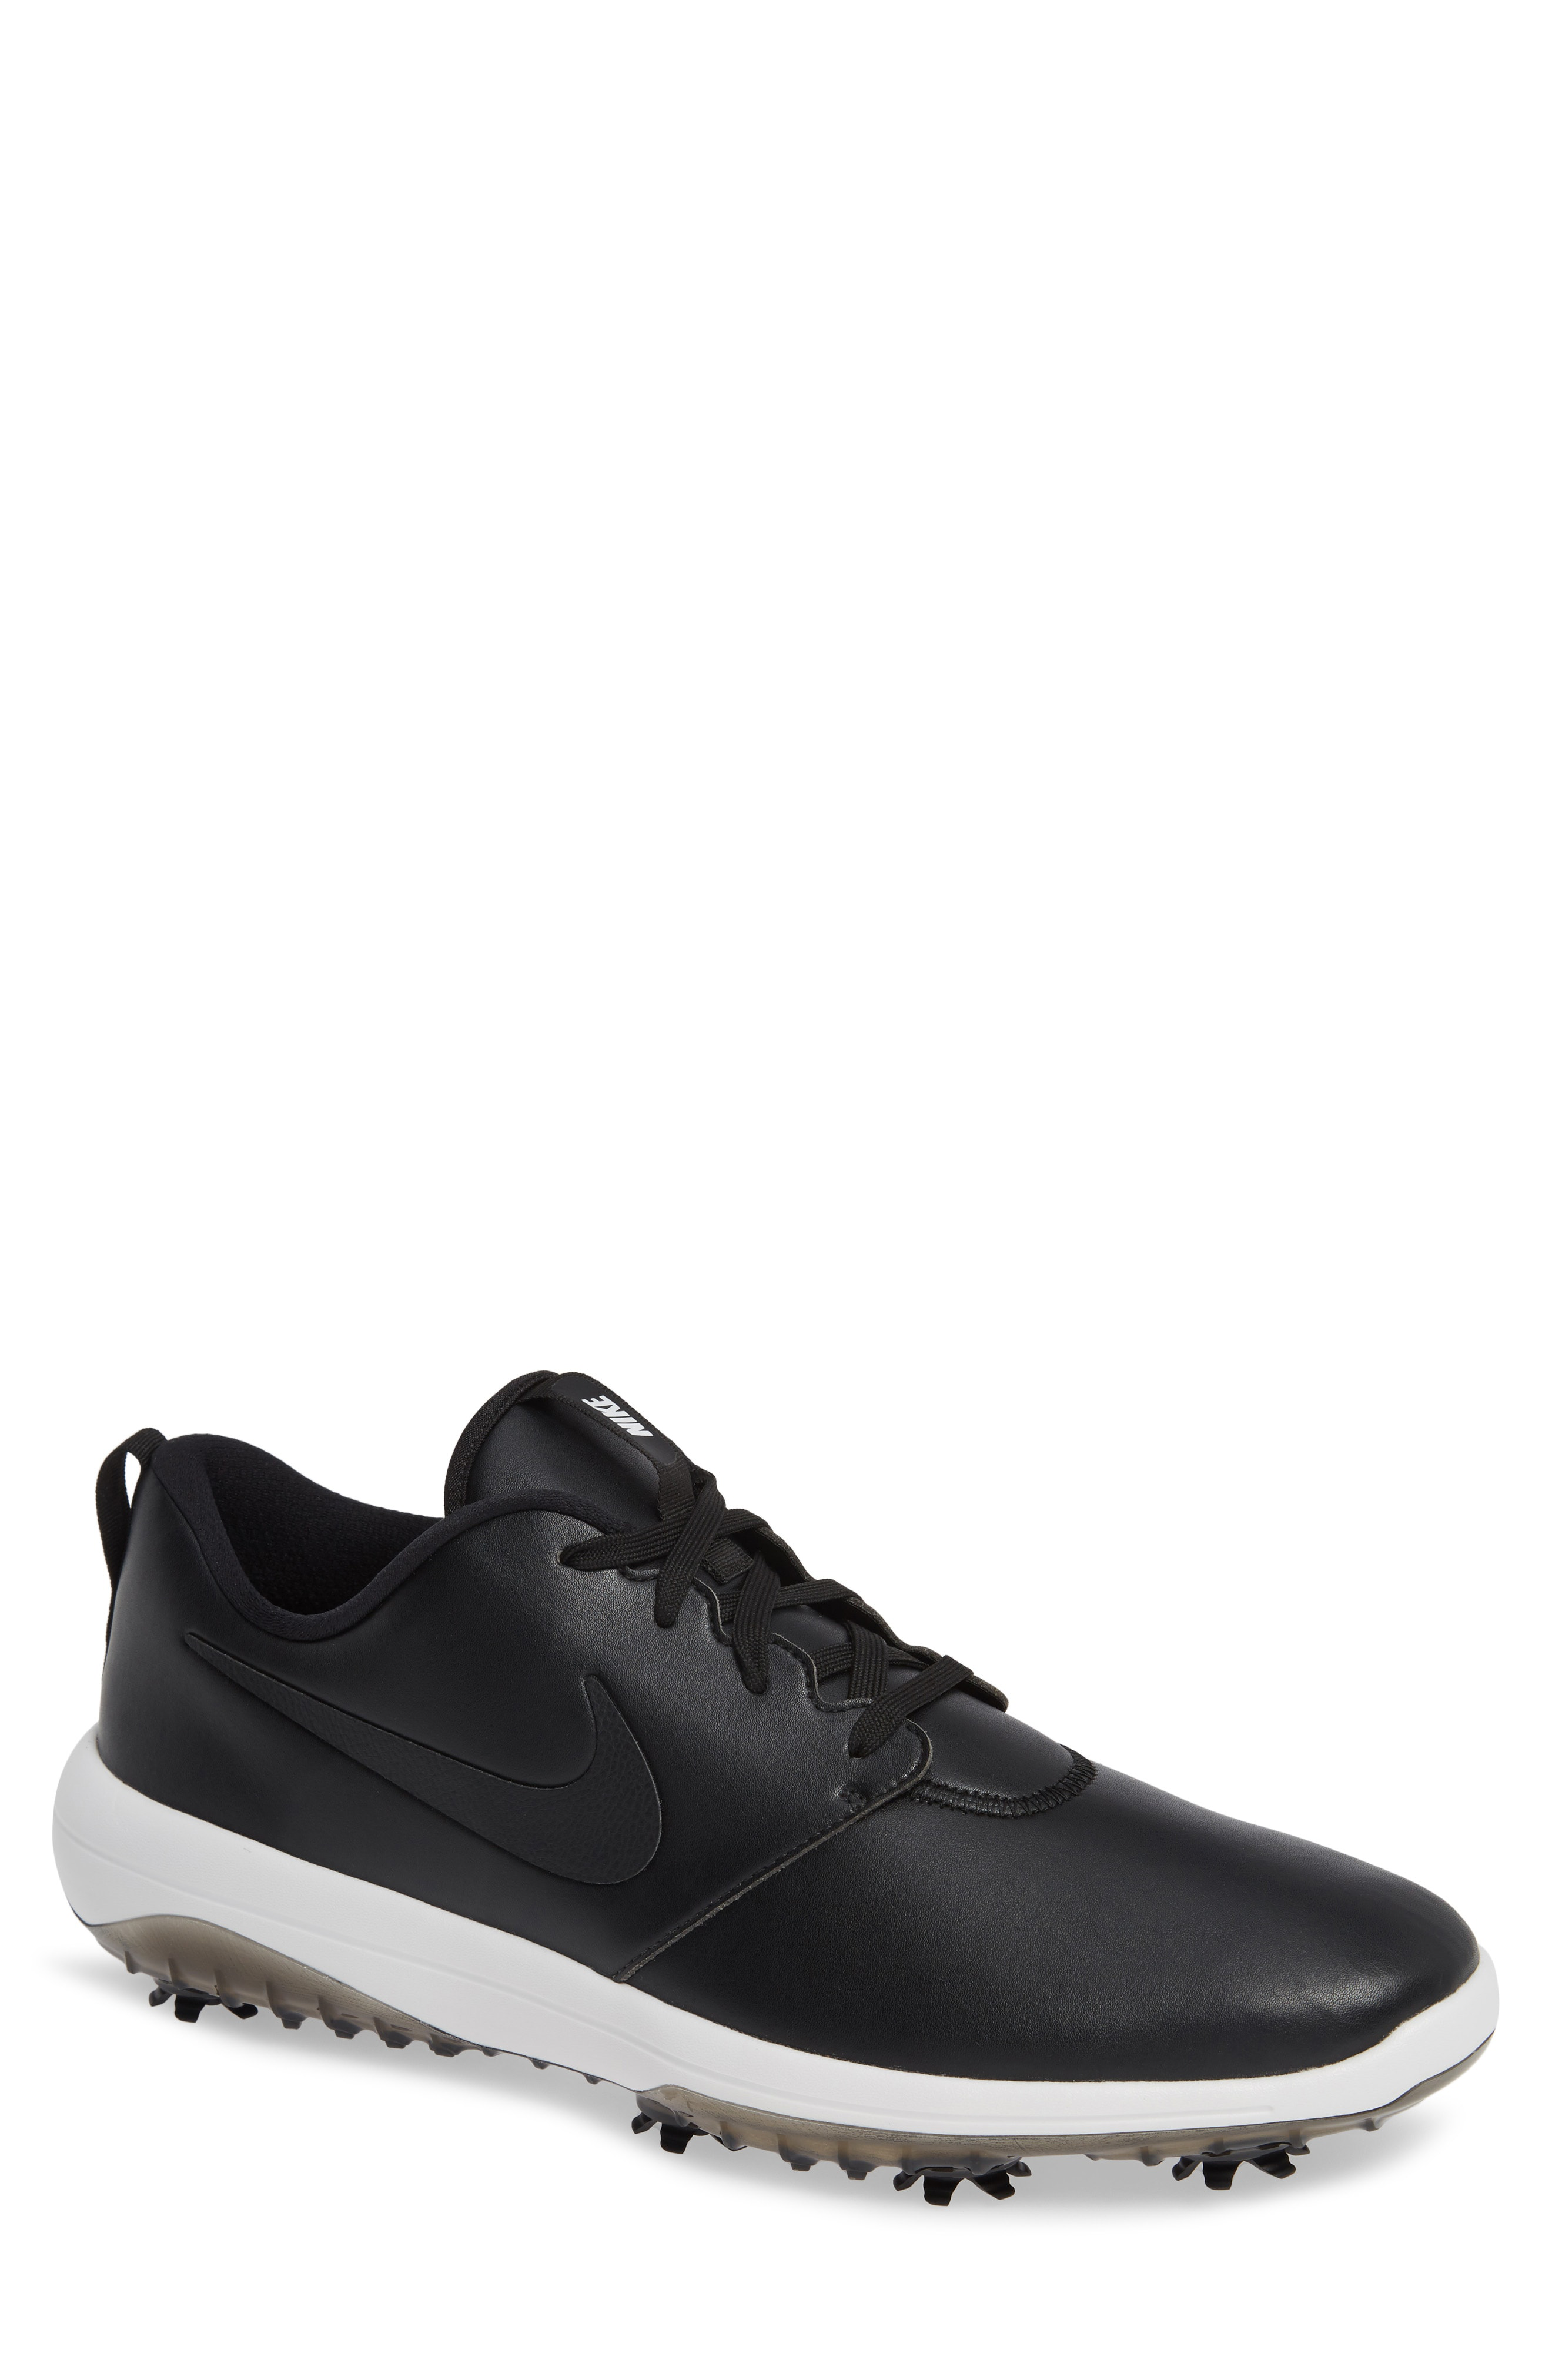 Shop Nike Roshe G Tour Golf Shoe In Black Summit White